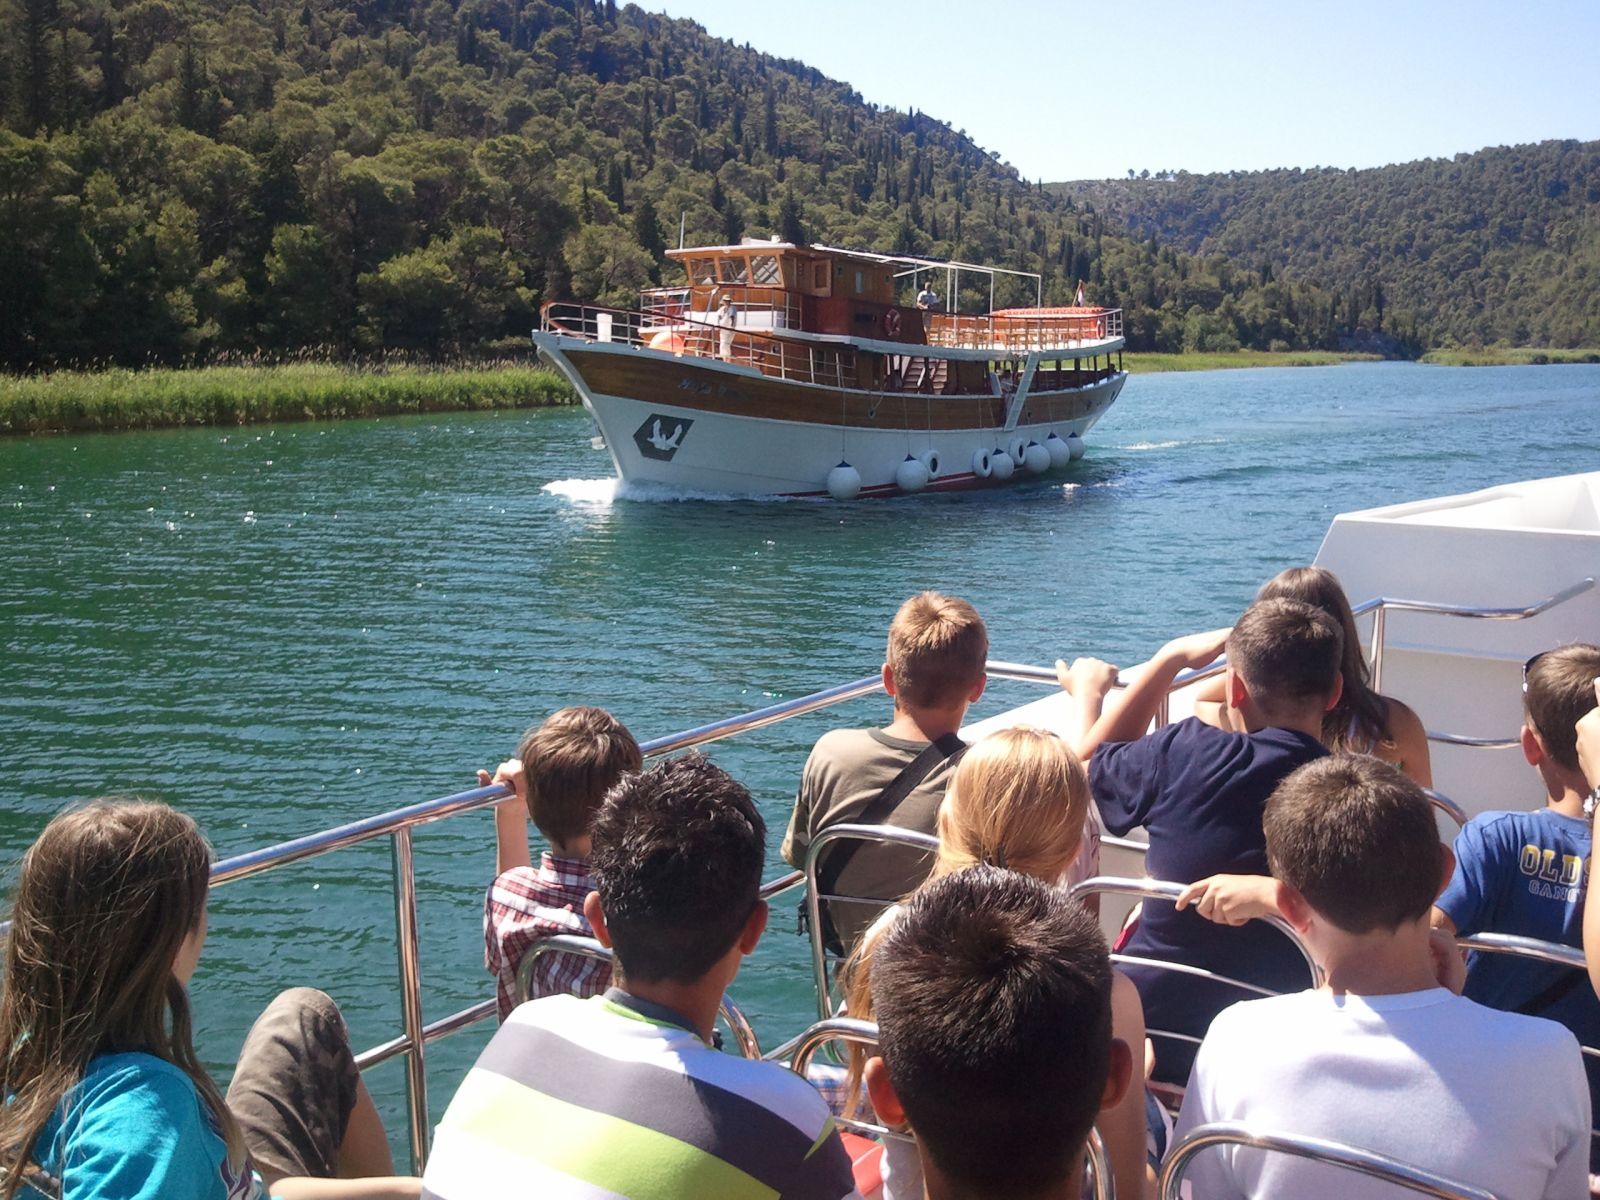 Najbolje od srednje i sjeverne Dalmacije: Nacionalni park Krka: vožnja brodom